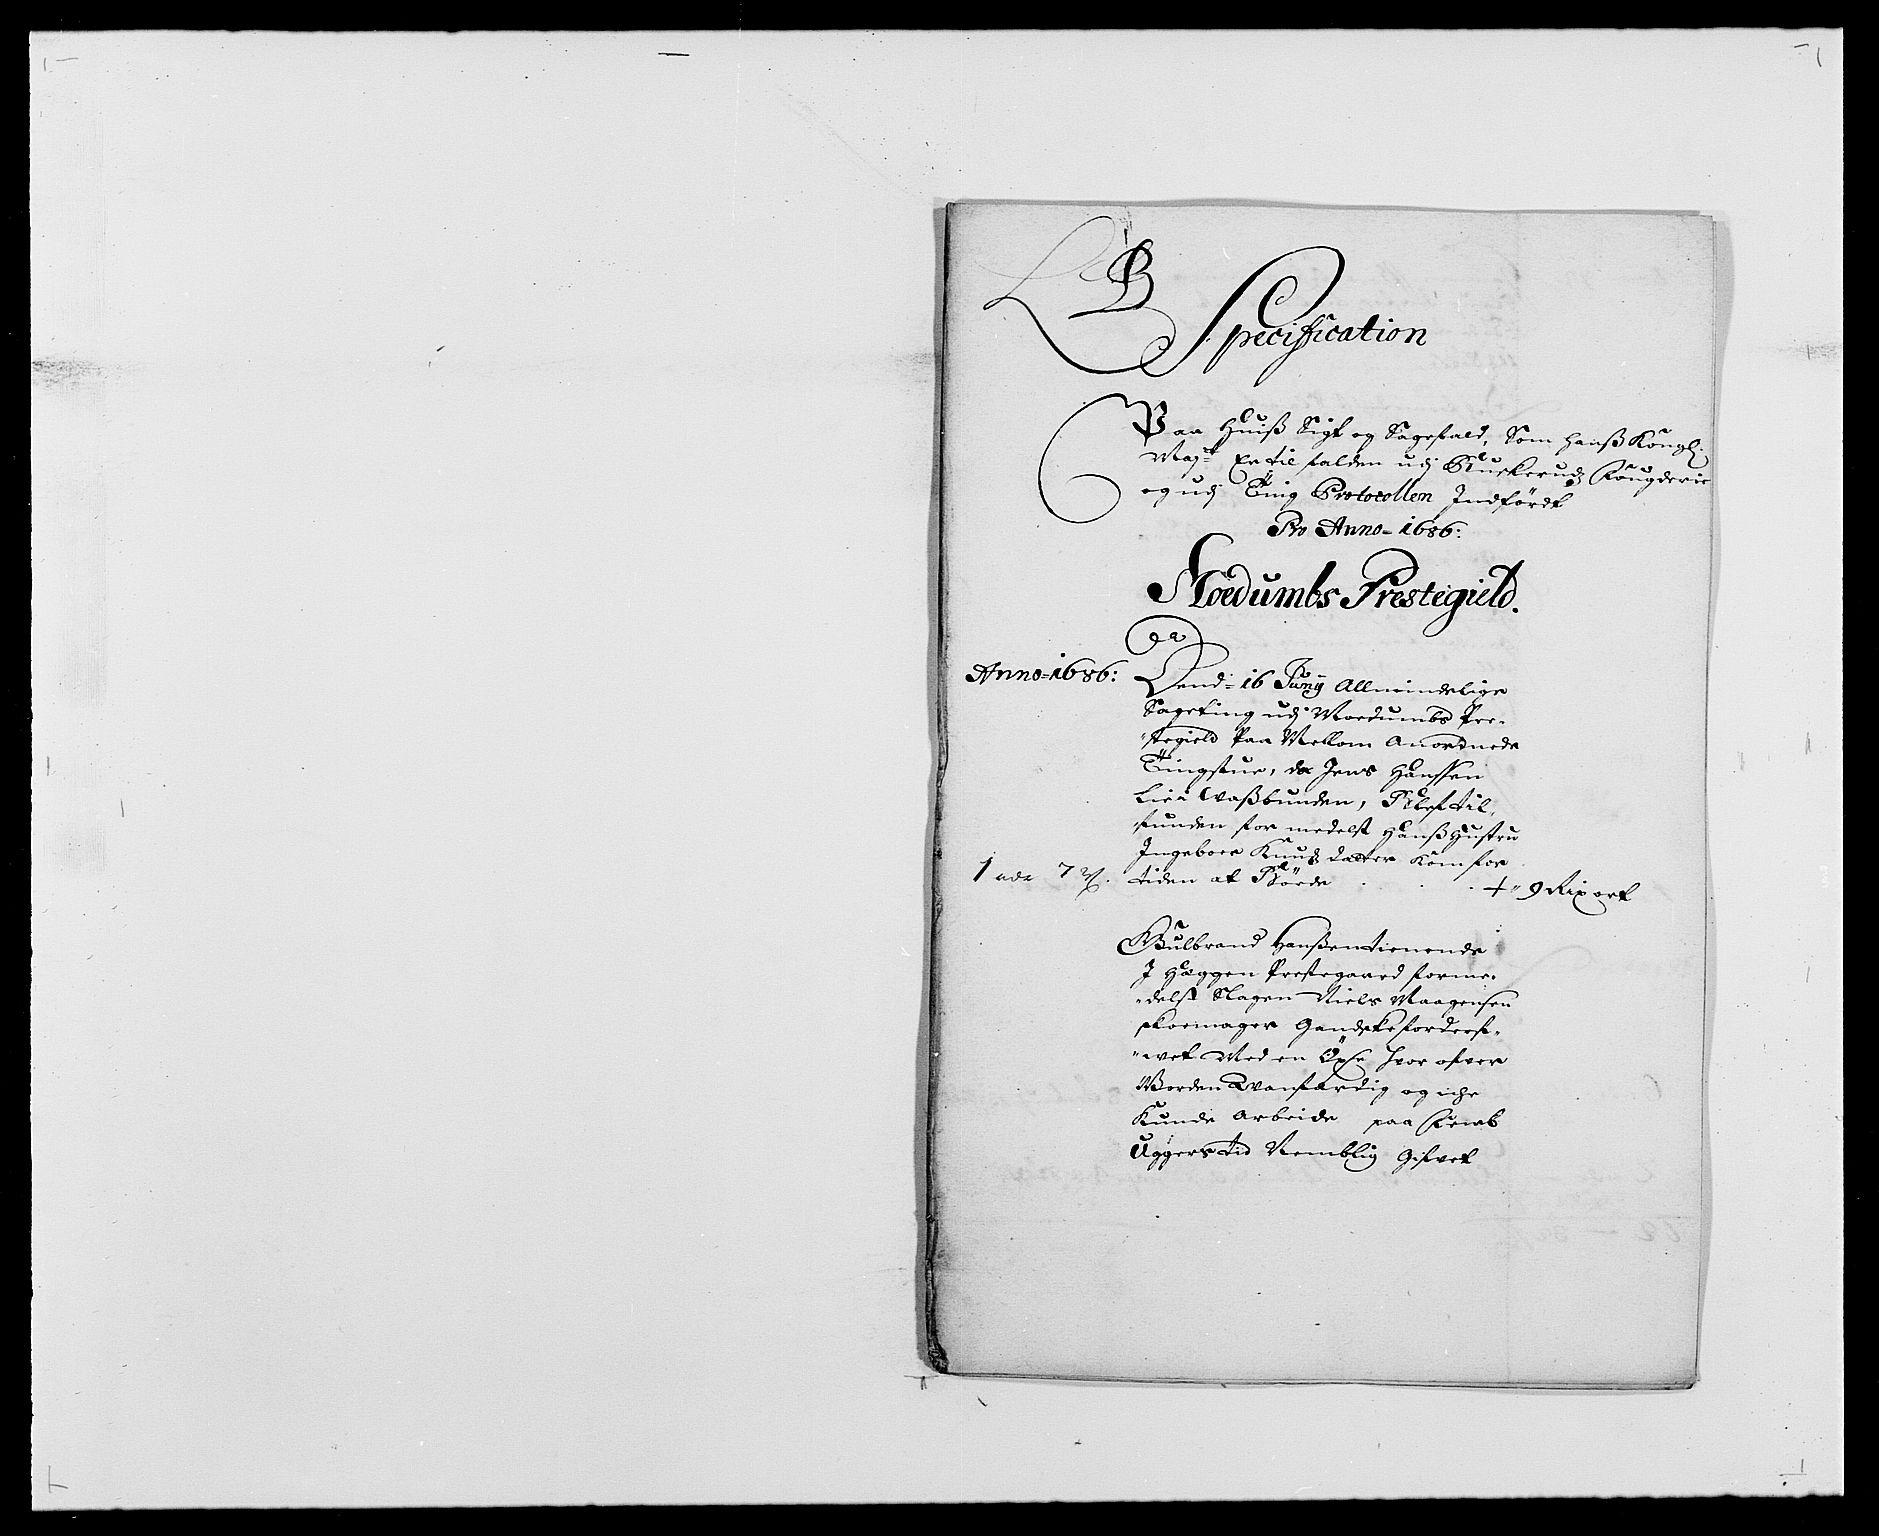 RA, Rentekammeret inntil 1814, Reviderte regnskaper, Fogderegnskap, R25/L1678: Fogderegnskap Buskerud, 1685-1686, s. 251